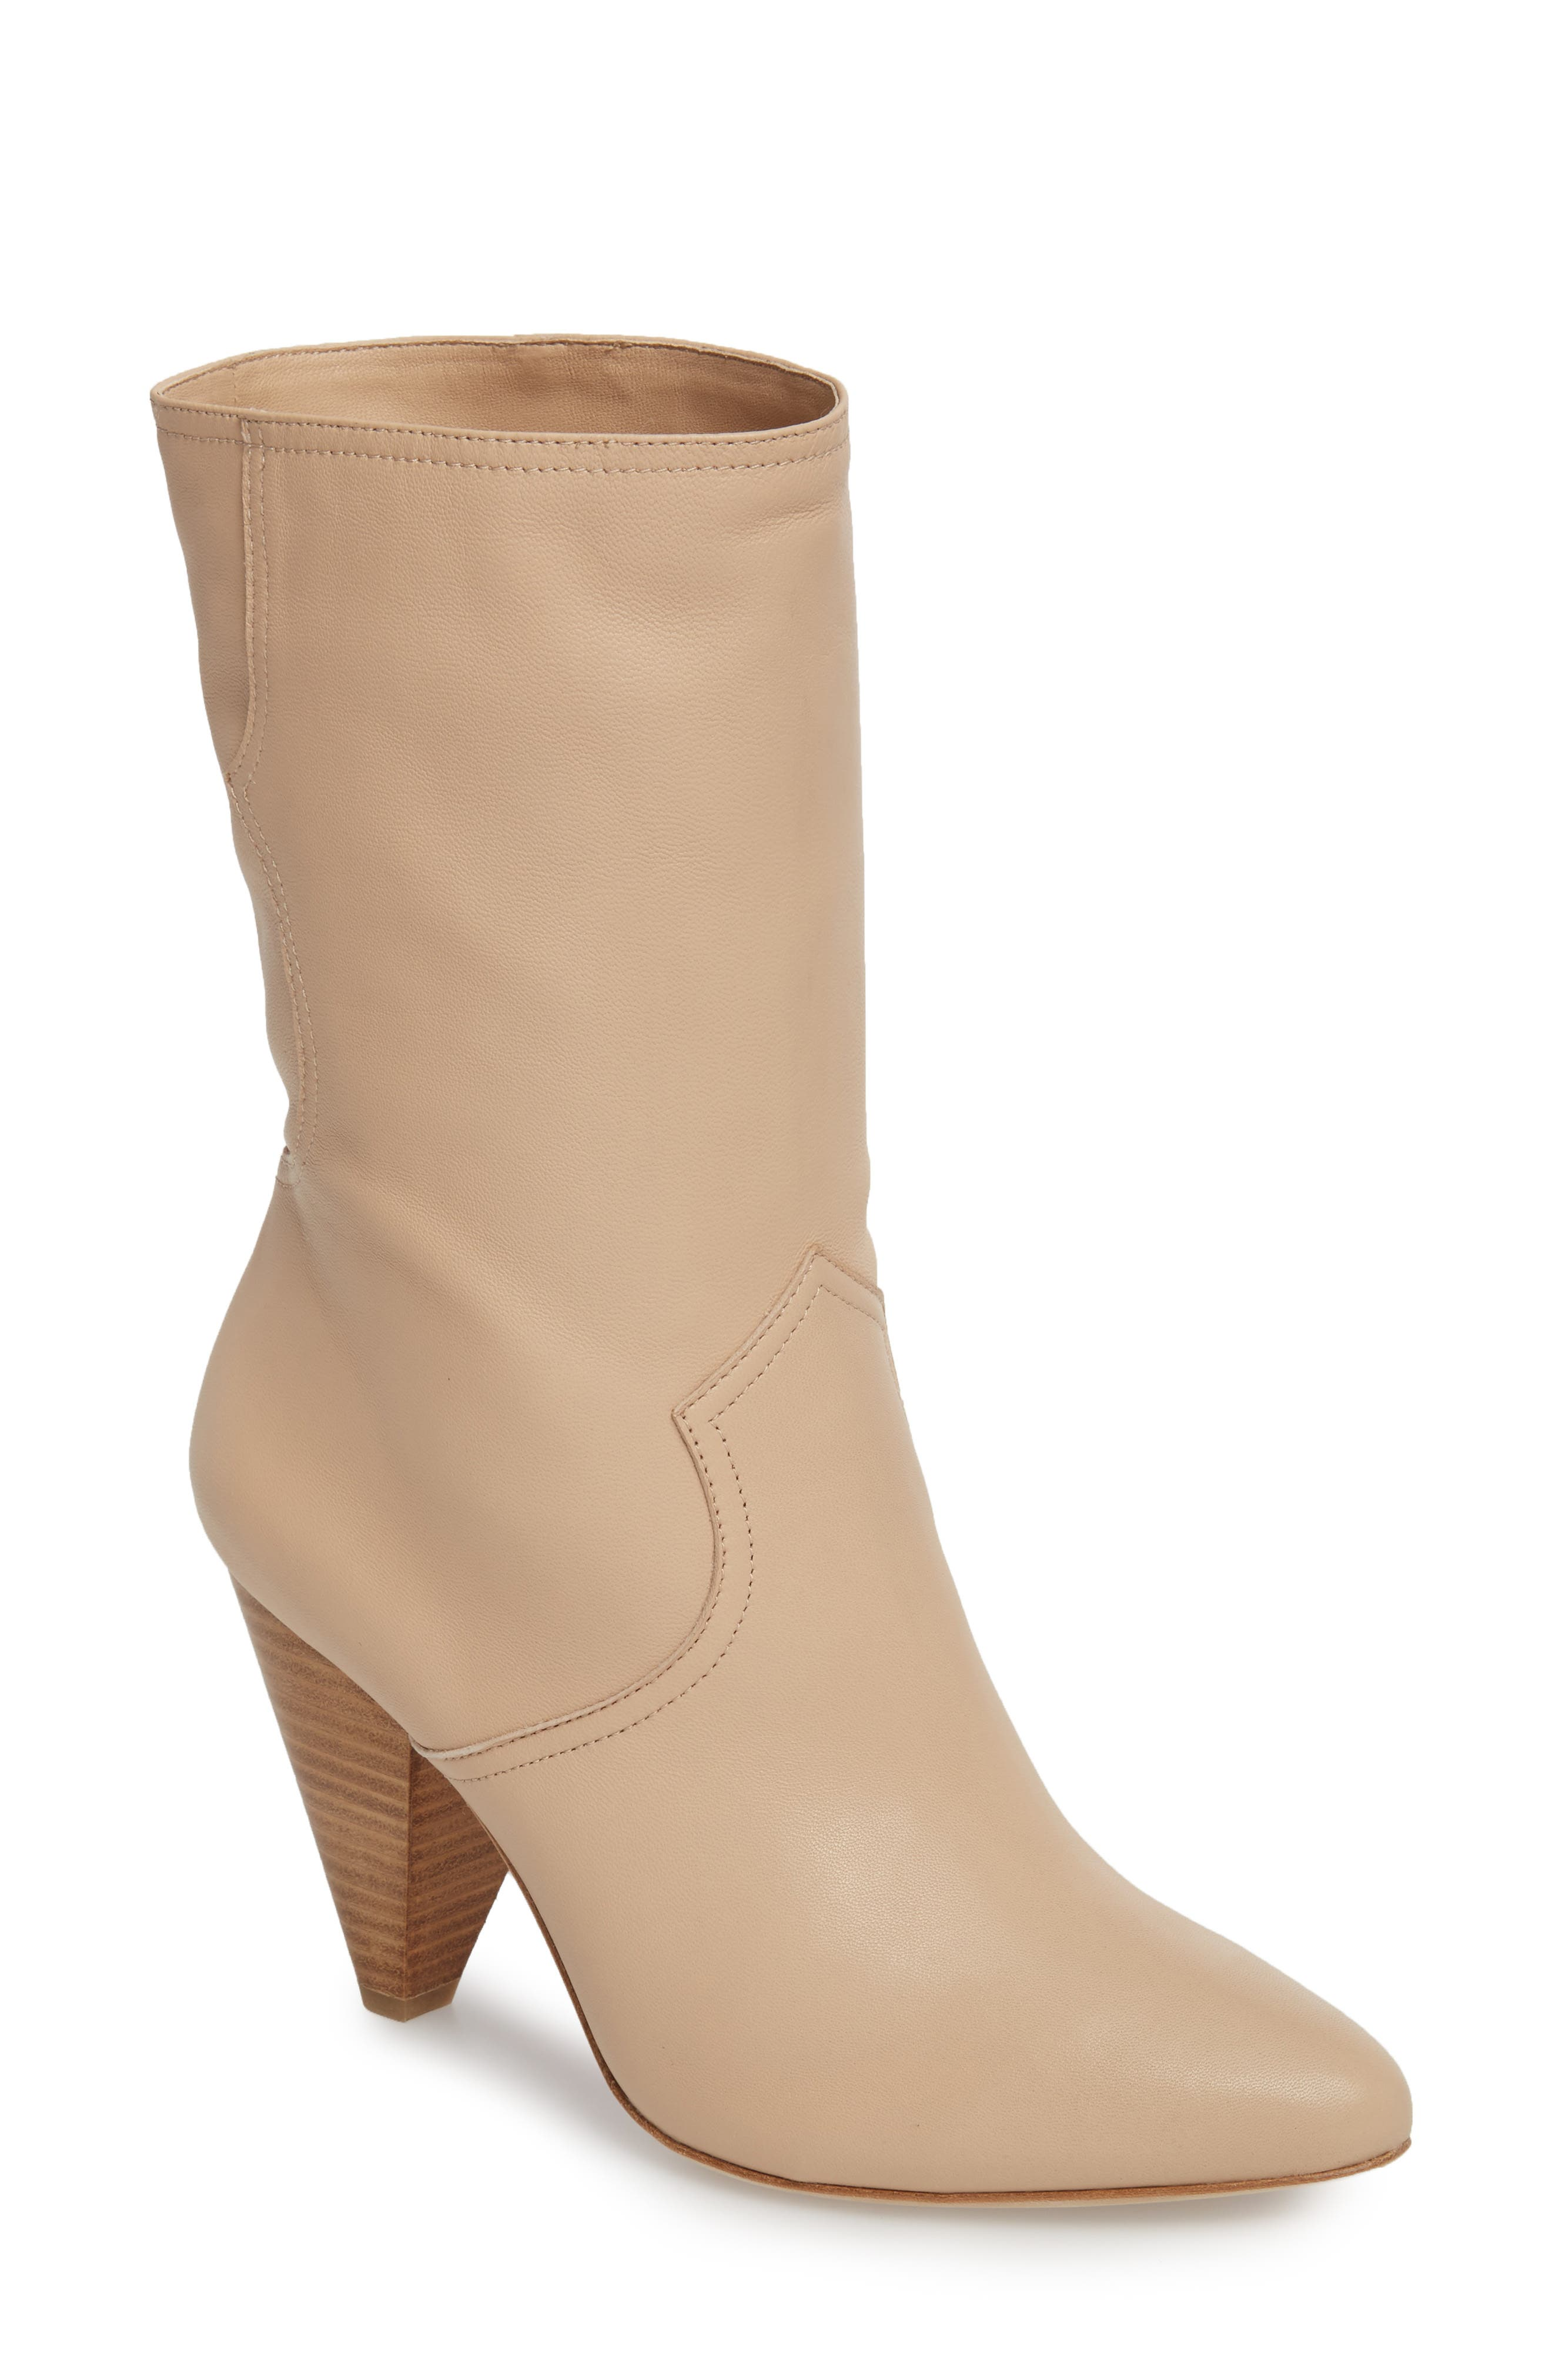 Gabbissy Almond Toe Boot,                         Main,                         color, BLUSH